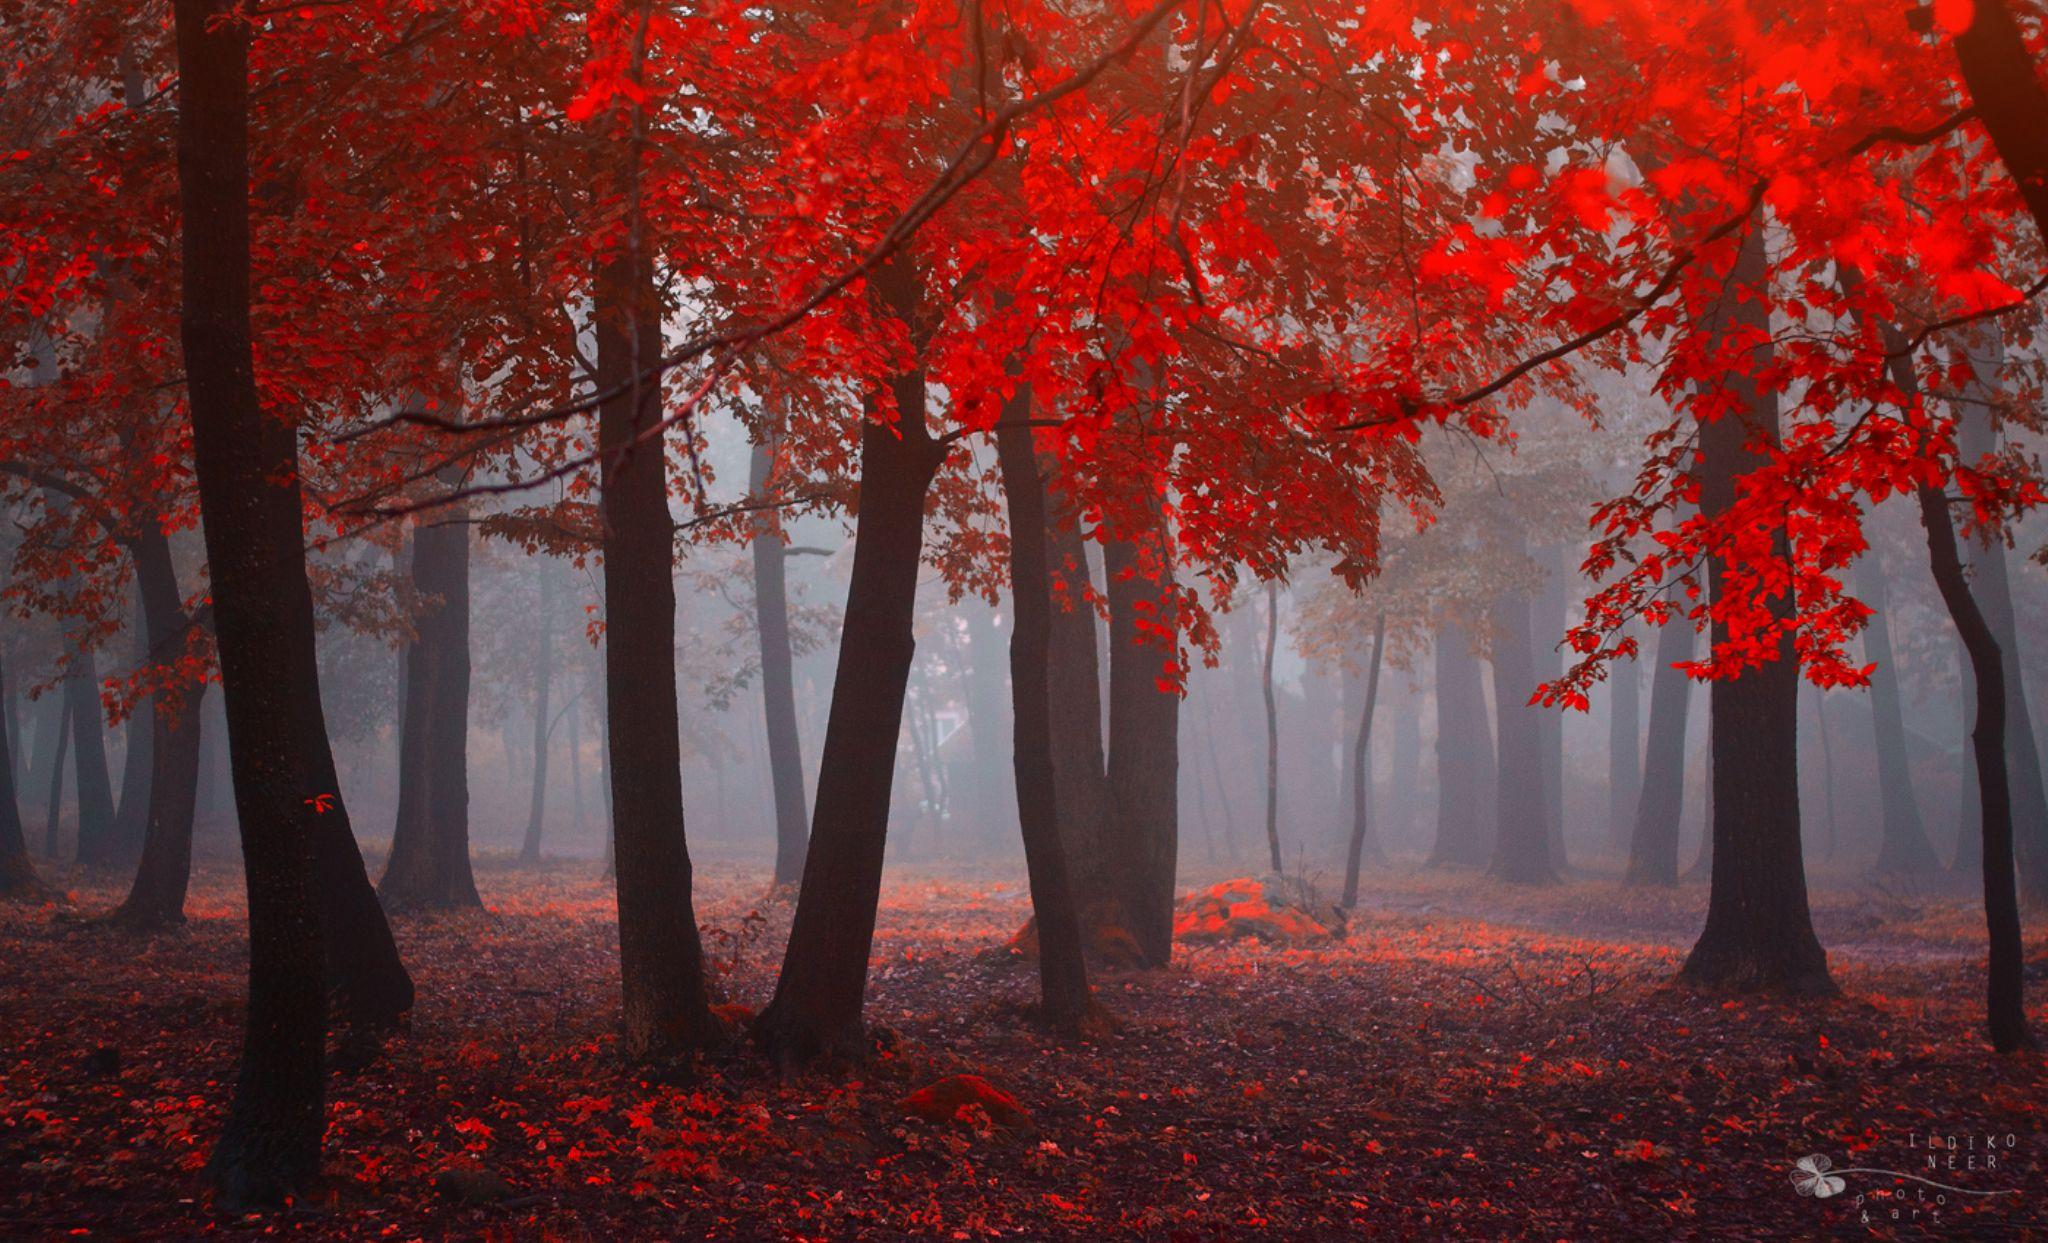 Fire Time by Ildiko Neer